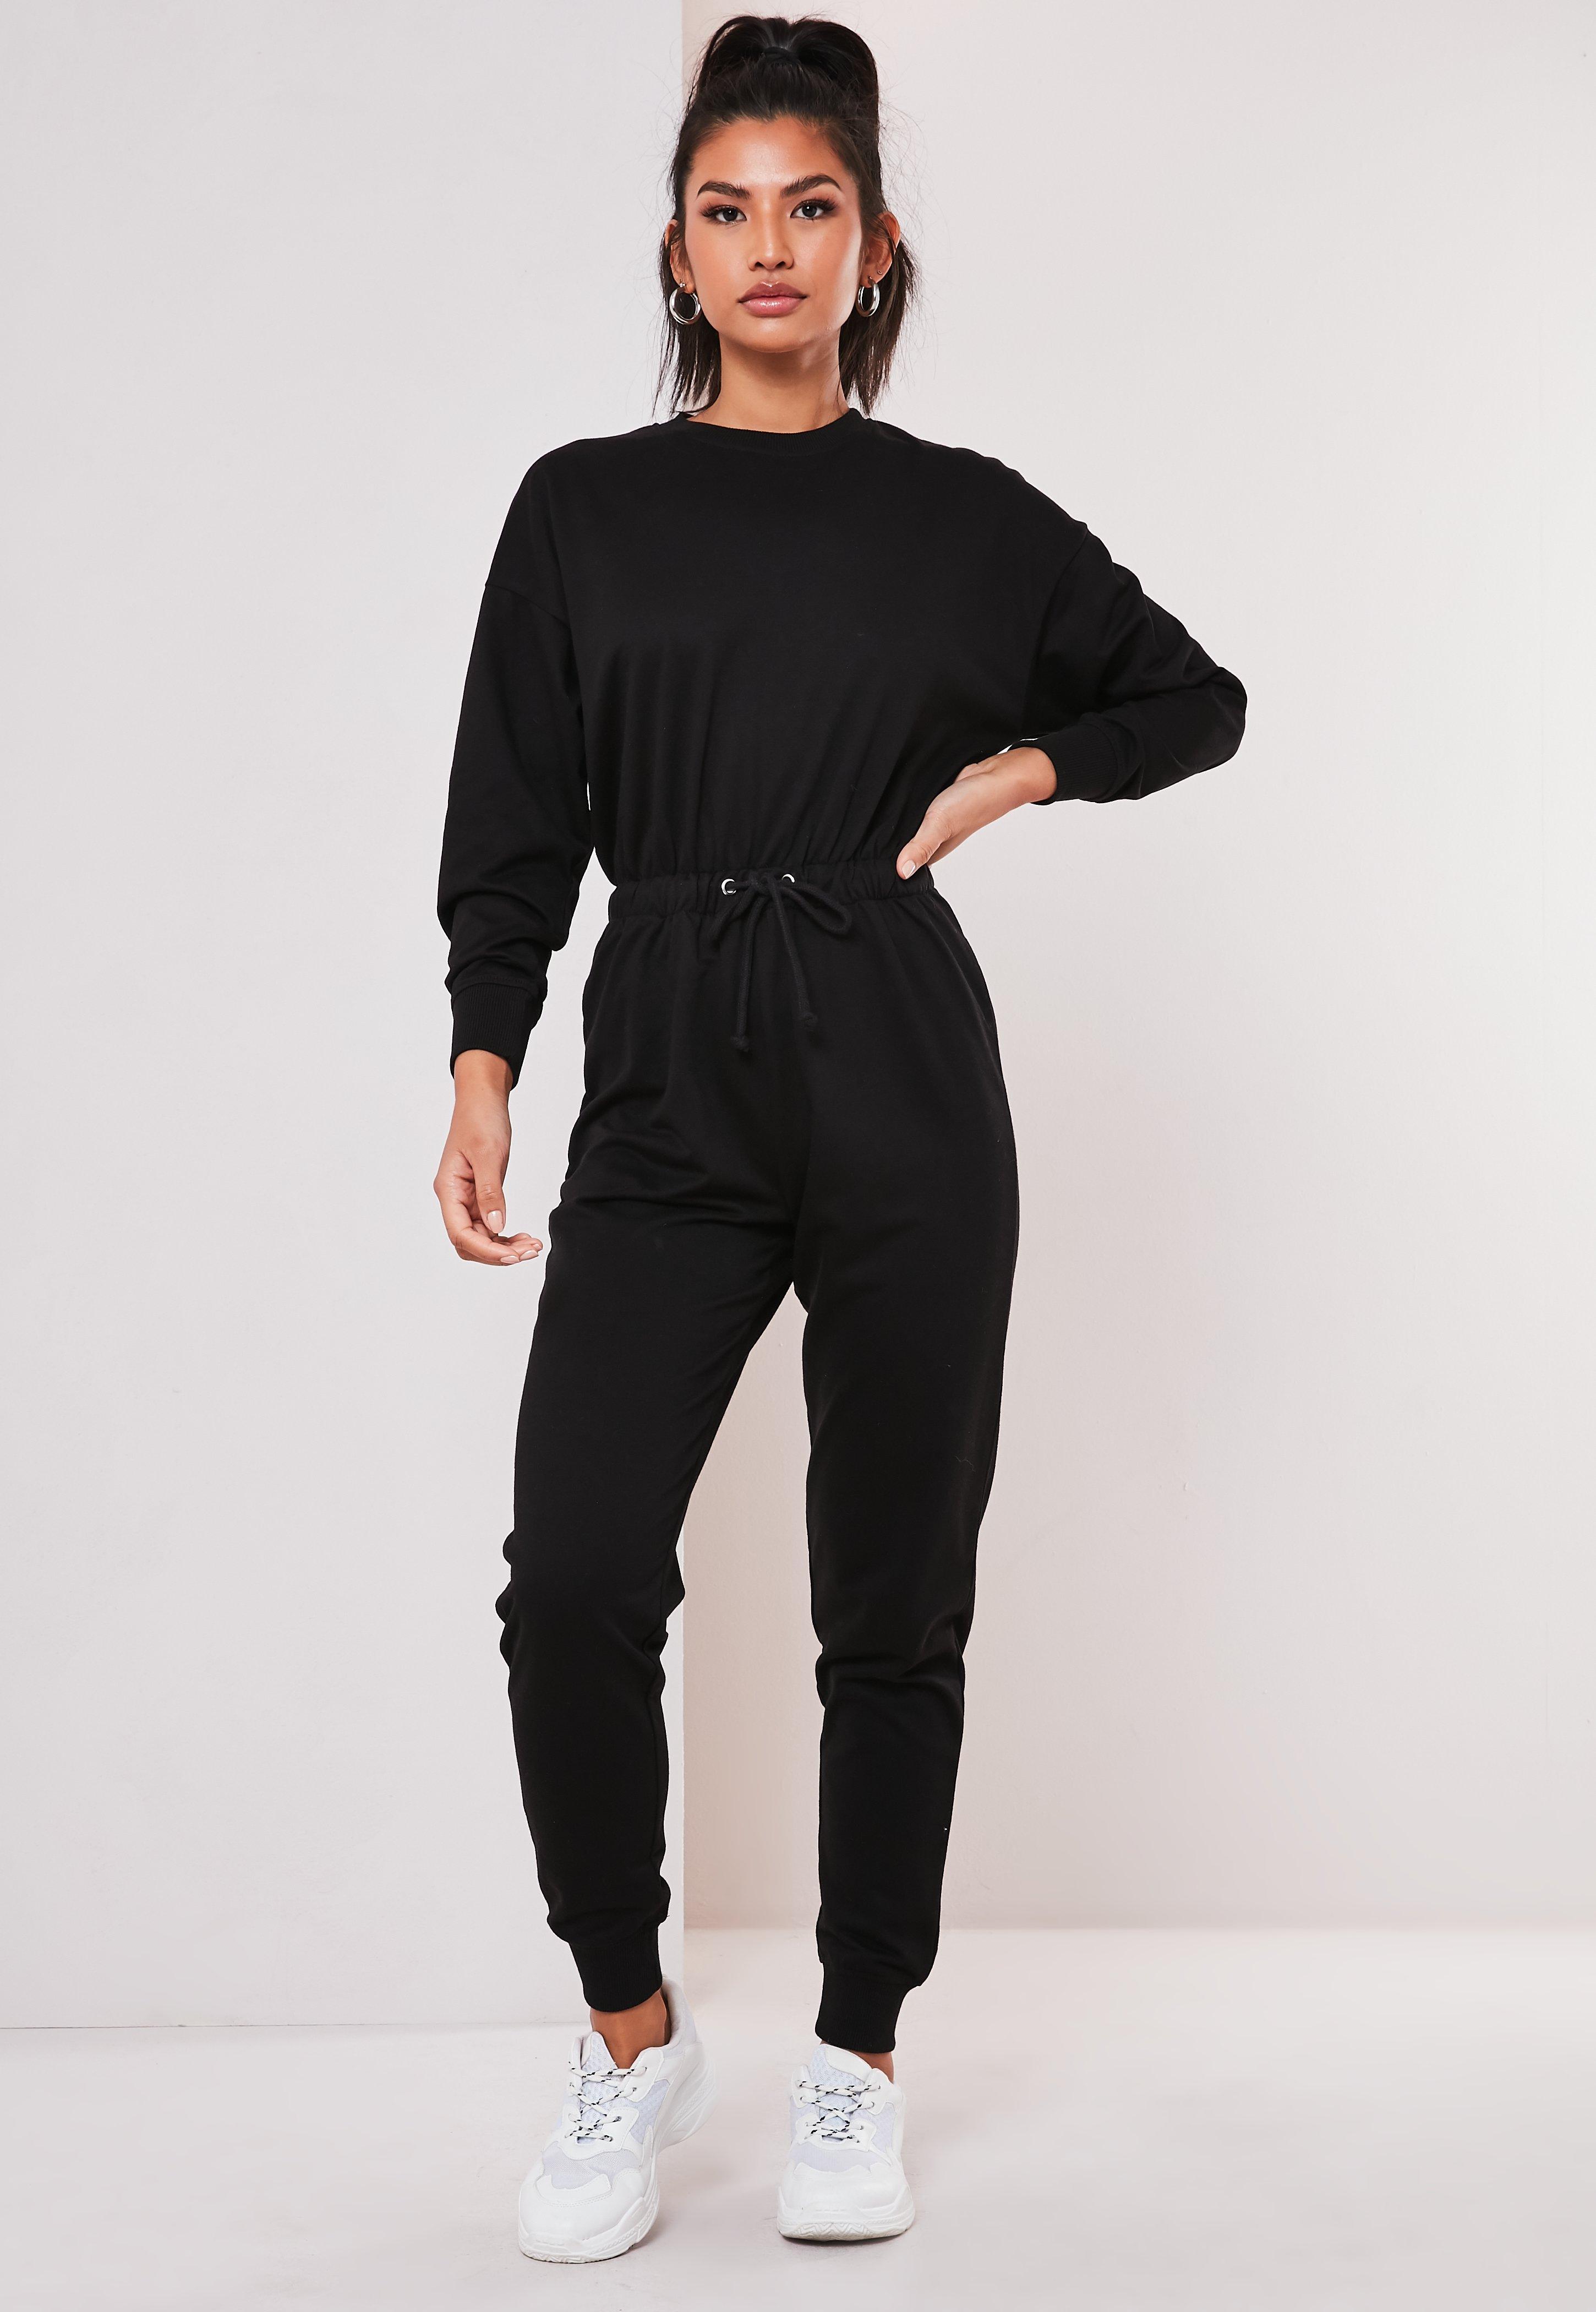 shop for authentic high quality great discount for Black Drop Shoulder Drawstring Waist Jumpsuit